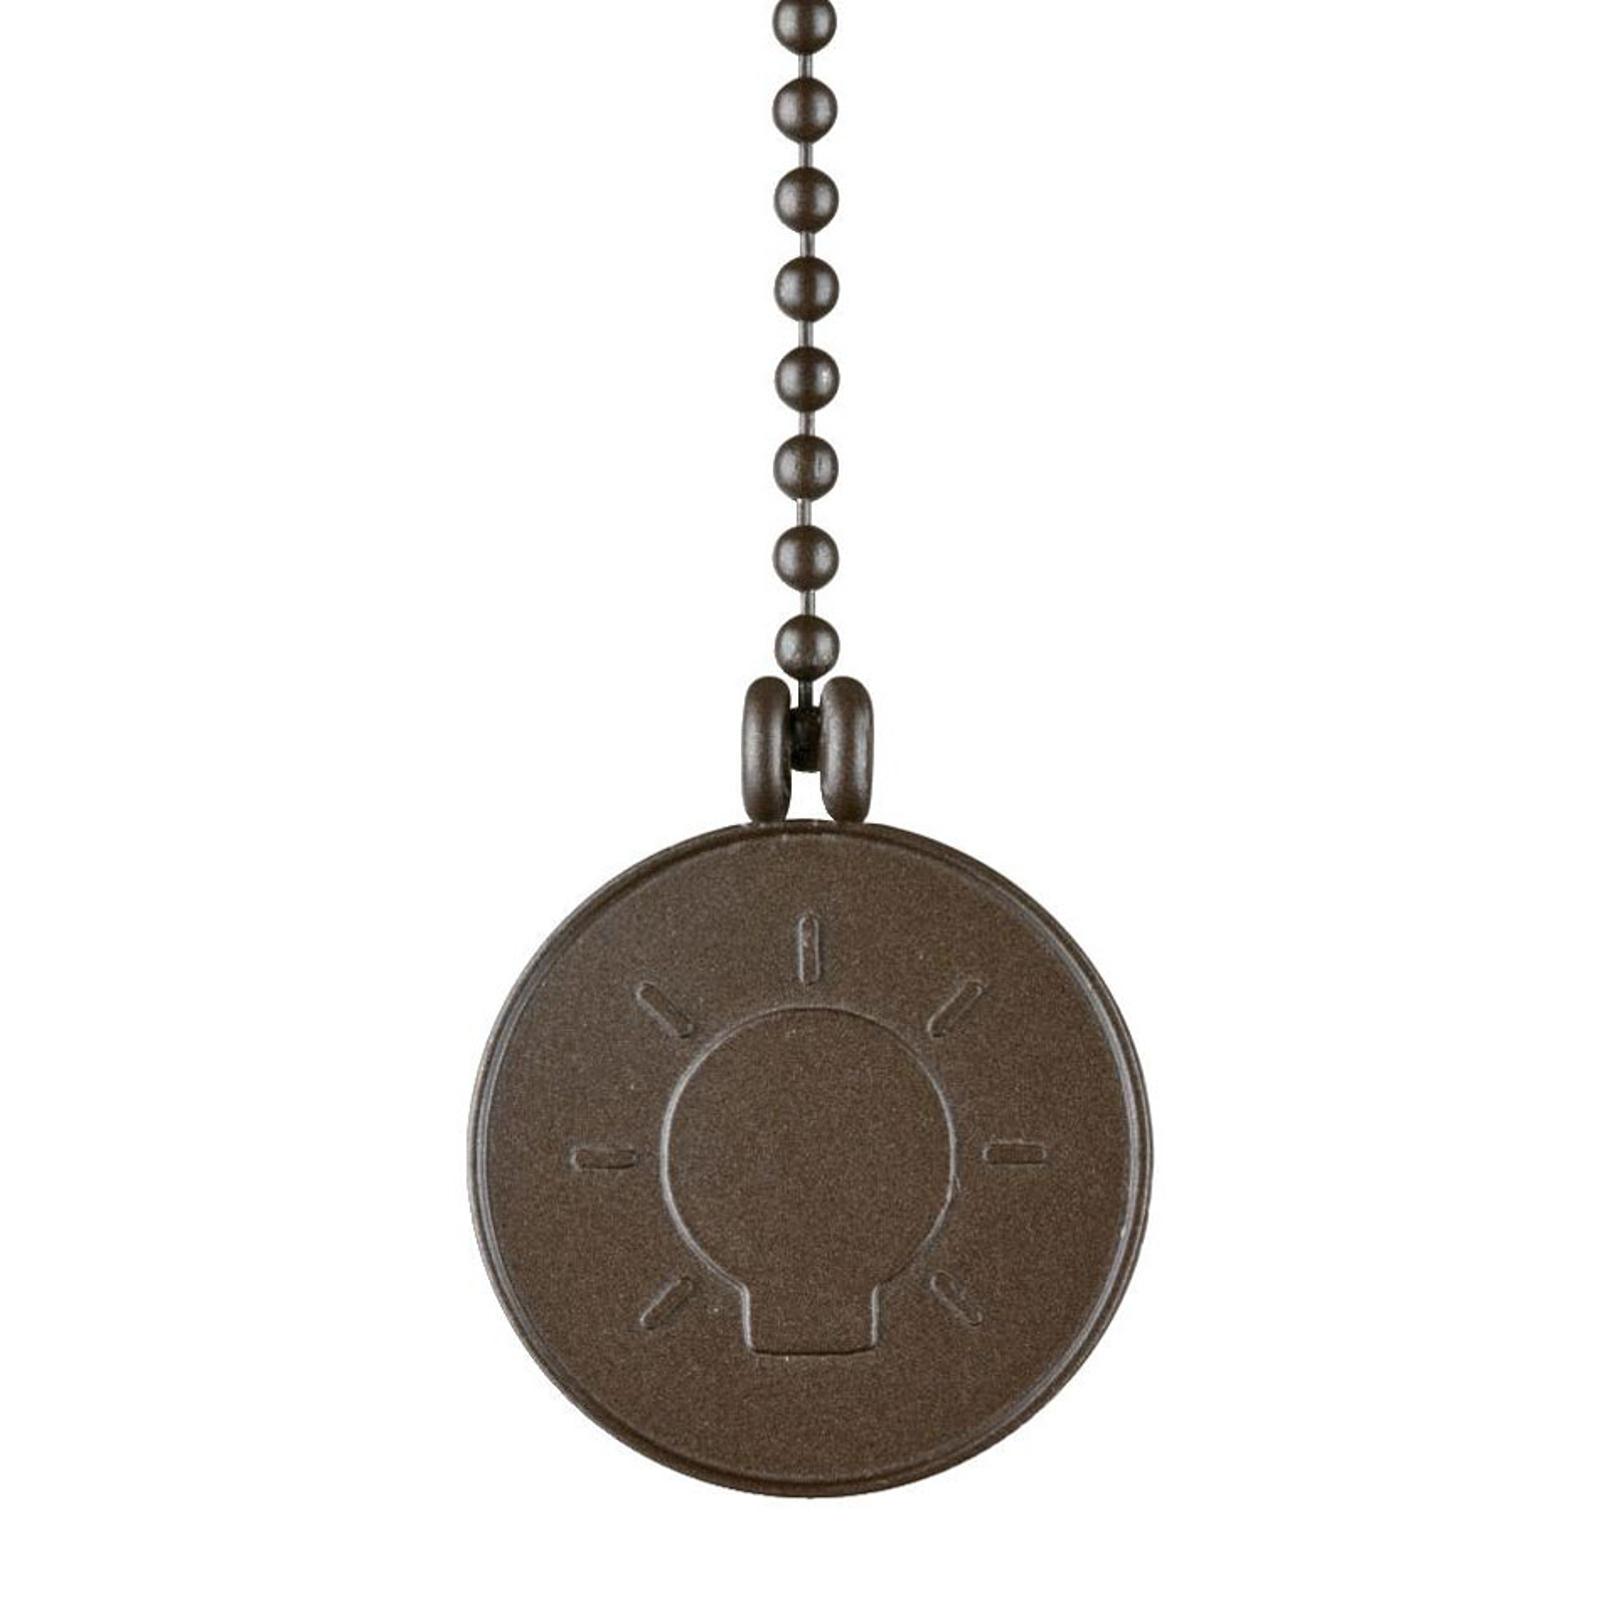 Westinghouse glødepære medaljon trækkæde bronze